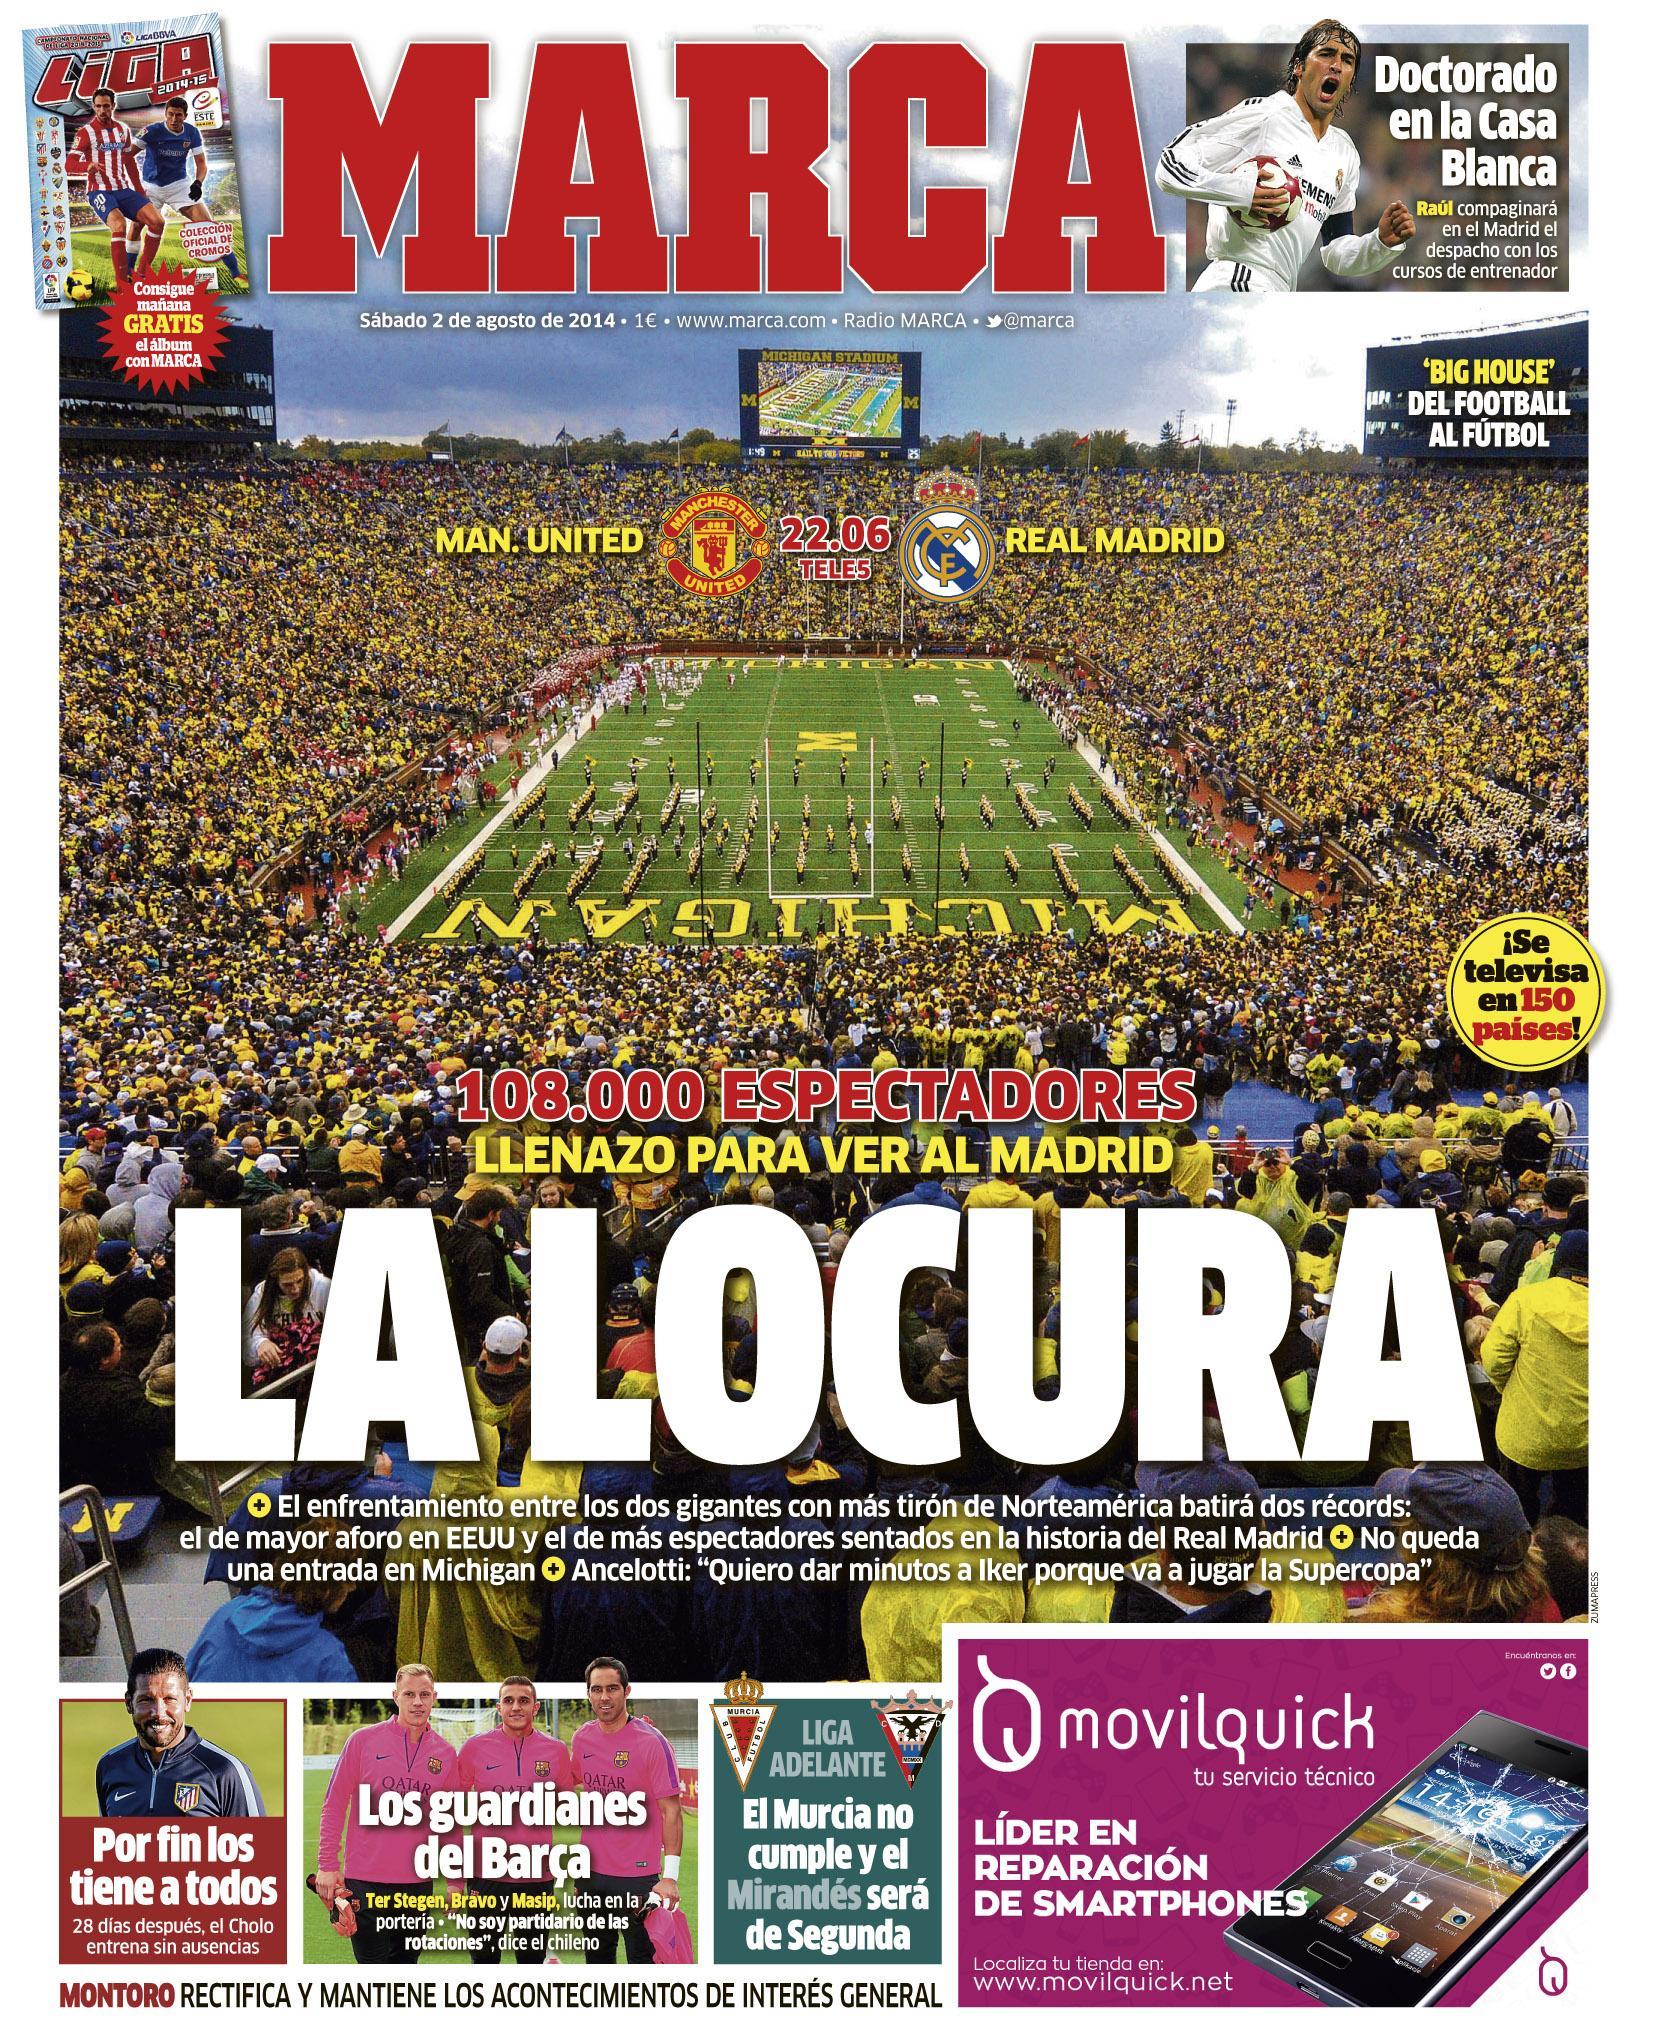 'La locura' #LaPortada http://t.co/kKrw32aL4n